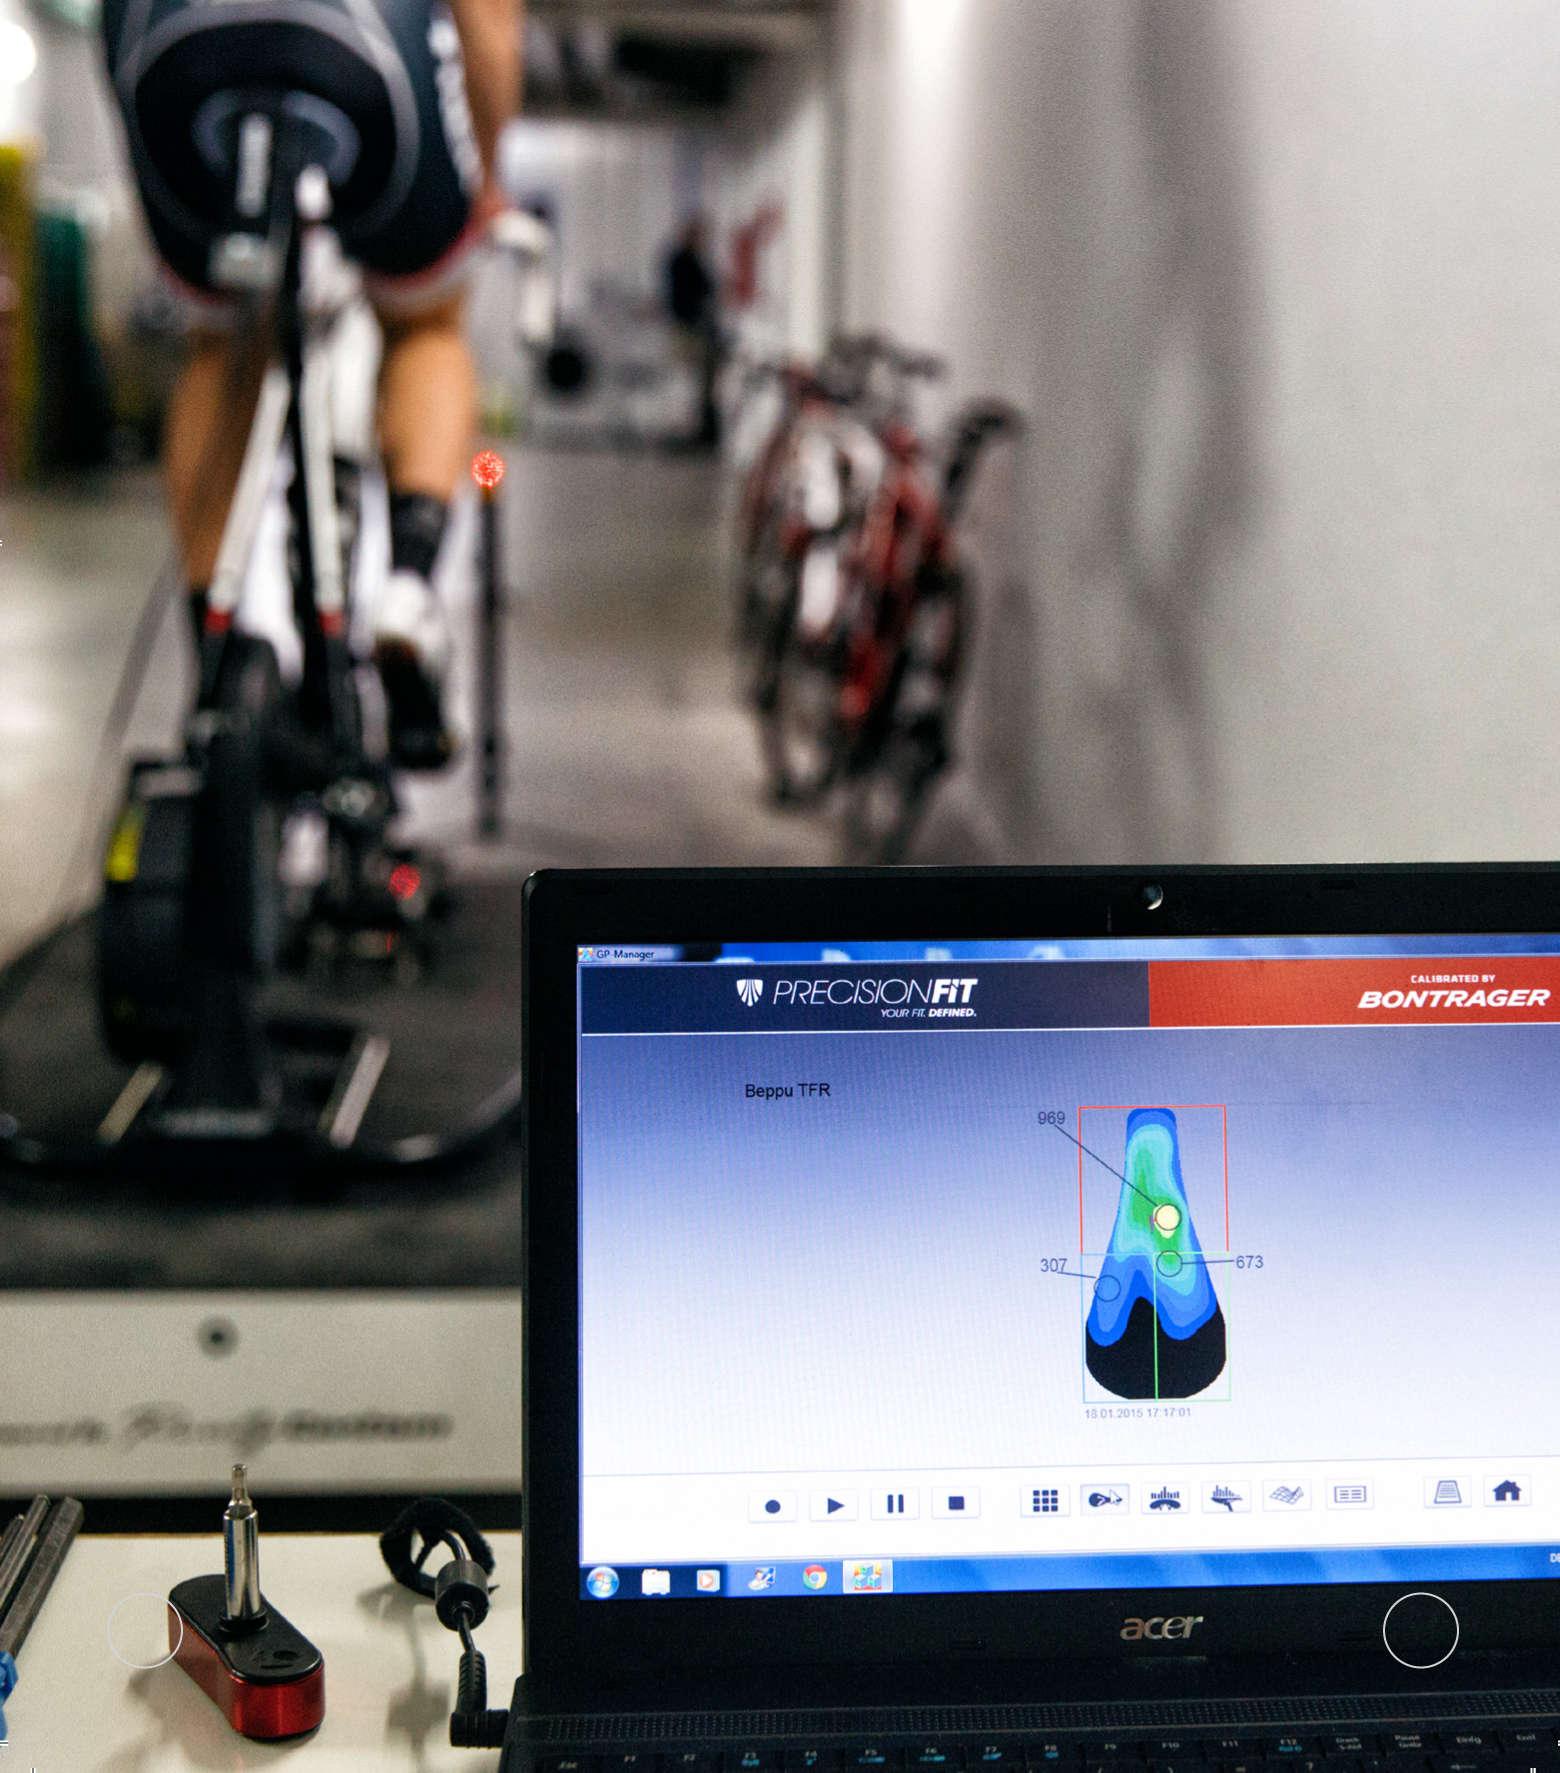 Trek Precision Bike Fitting Saddle Pressure Analysis Tool